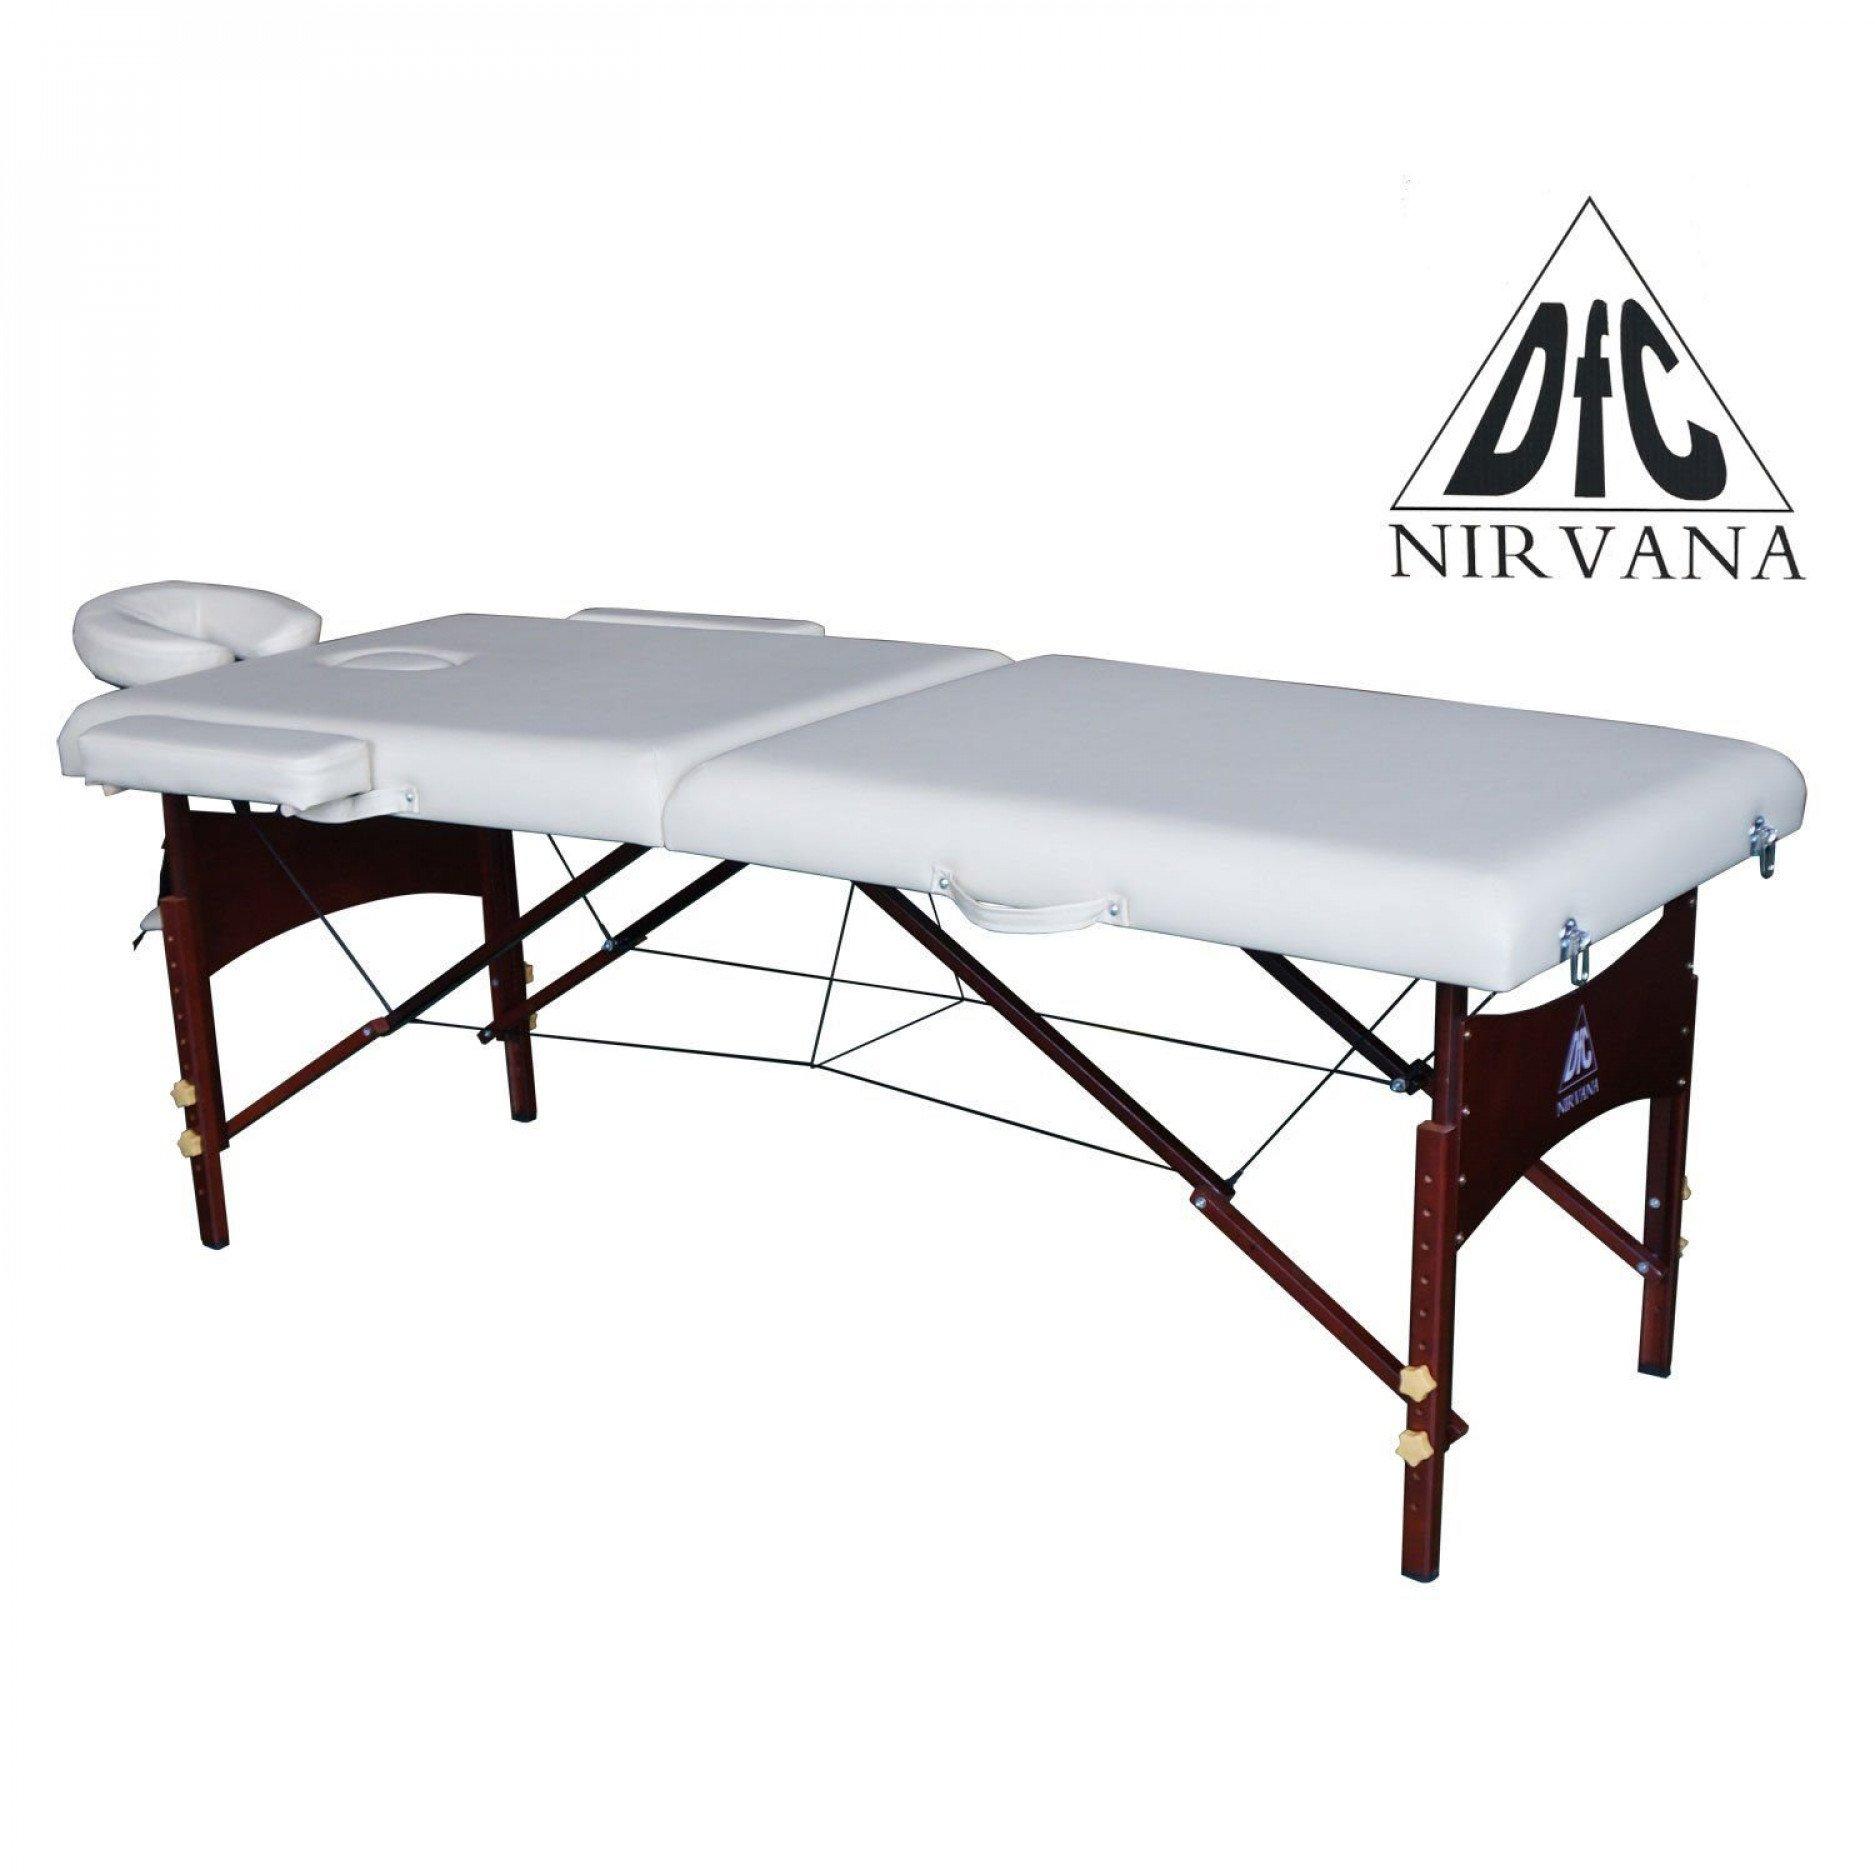 Массажный стол DFC NIRVANA Relax (бежевый)